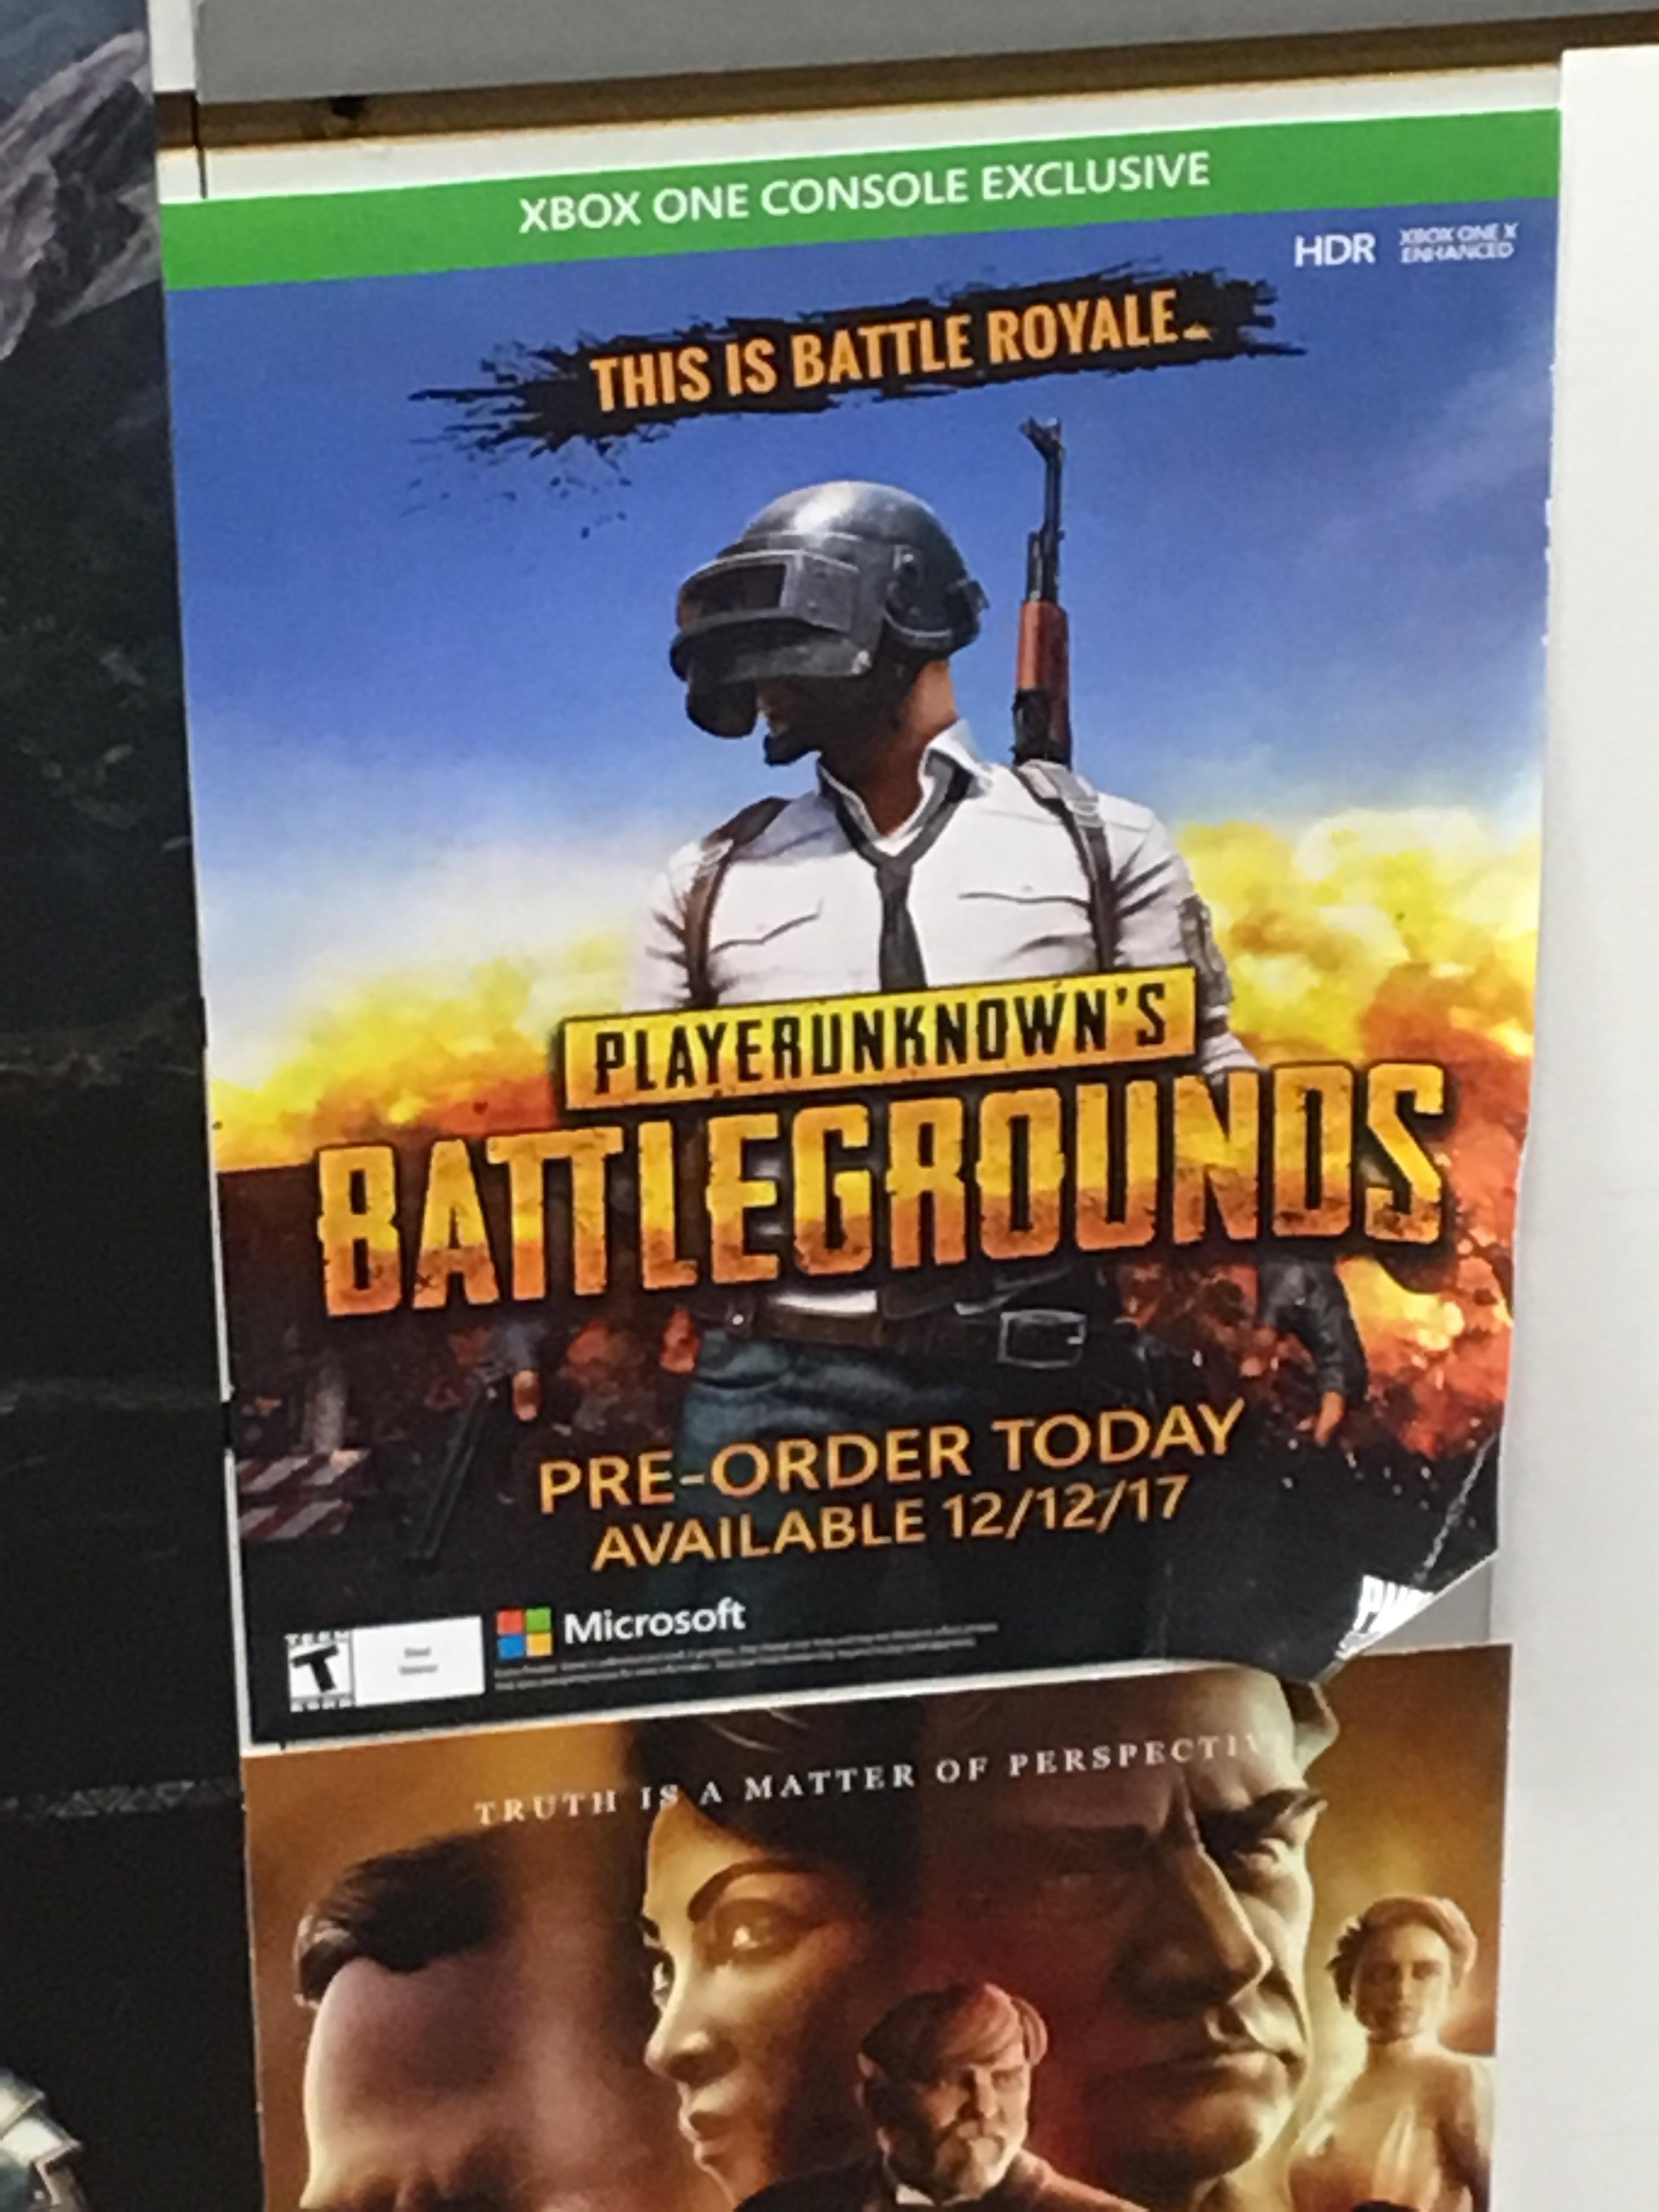 Xbox PUBG Pre Order Poster I Saw In GameStop PUBATTLEGROUNDS